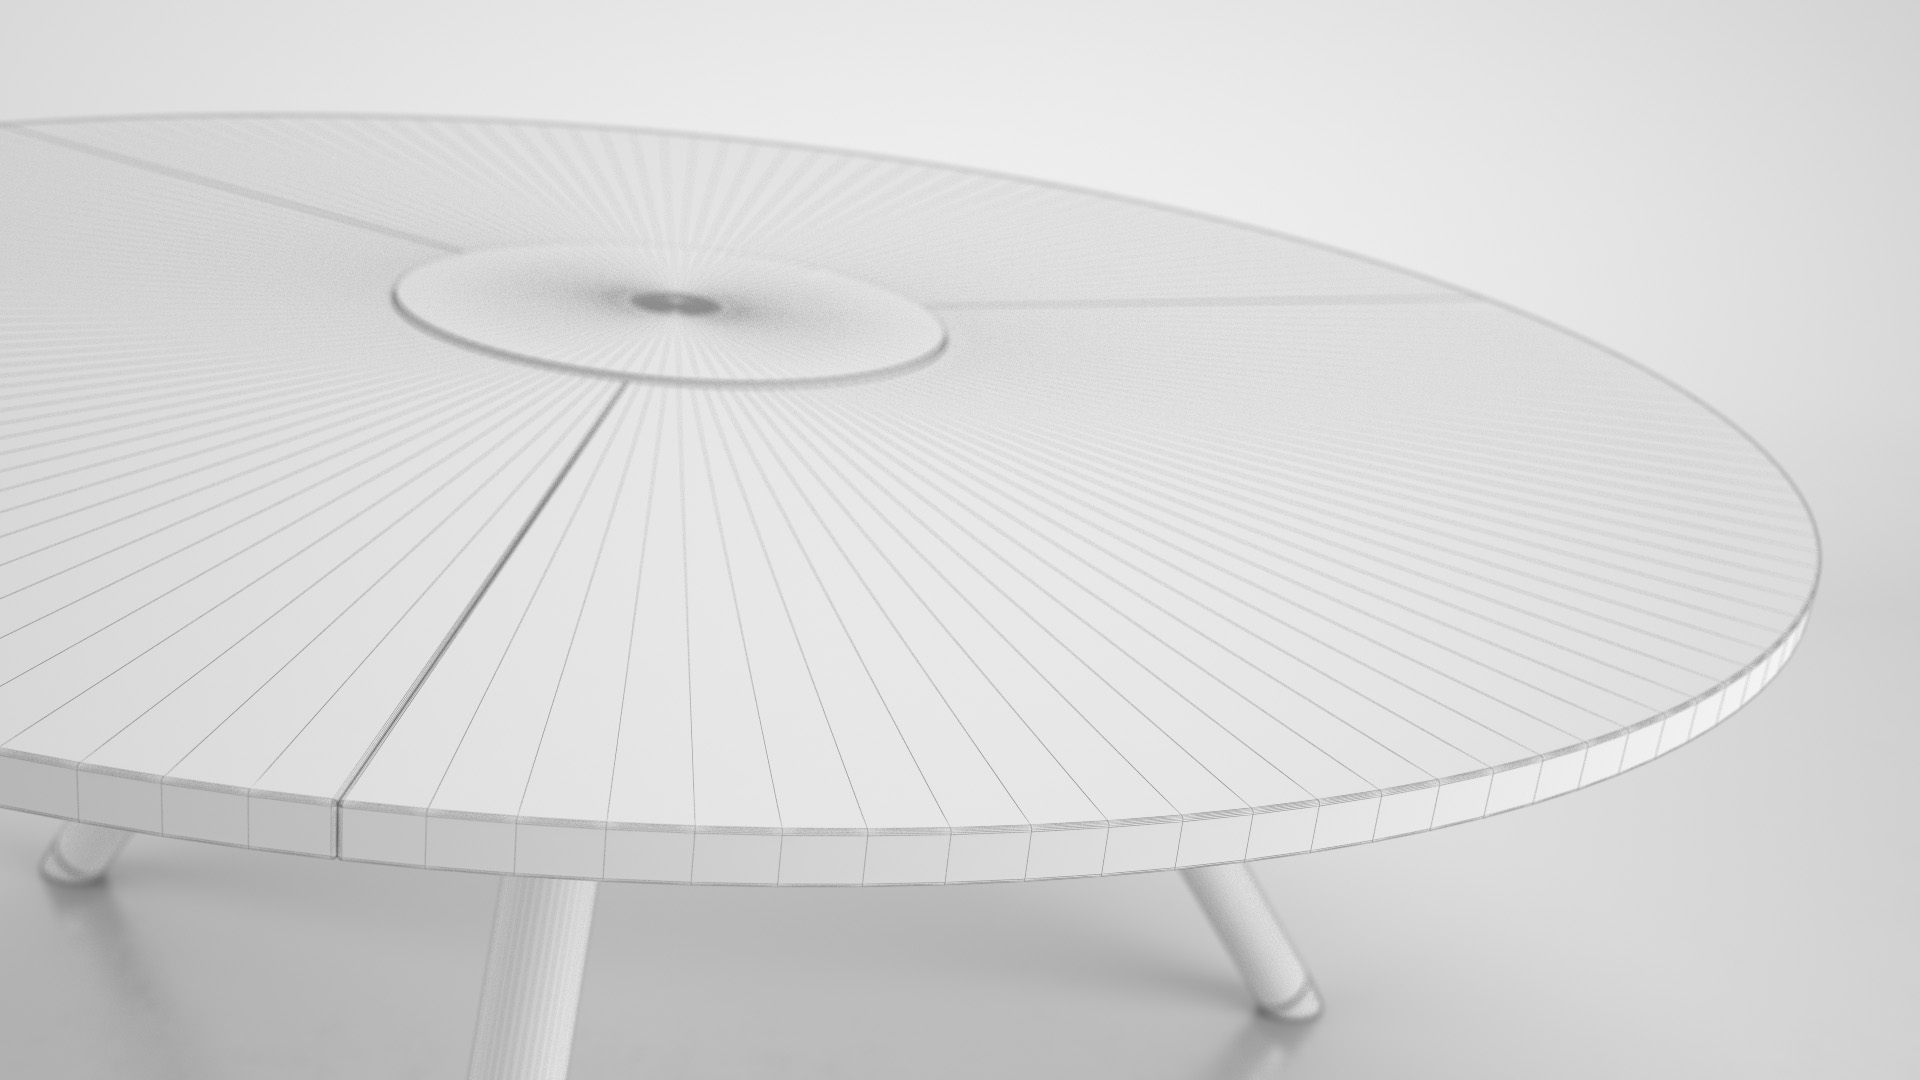 Zenith_Table_WhiteSet_01_wire_0004